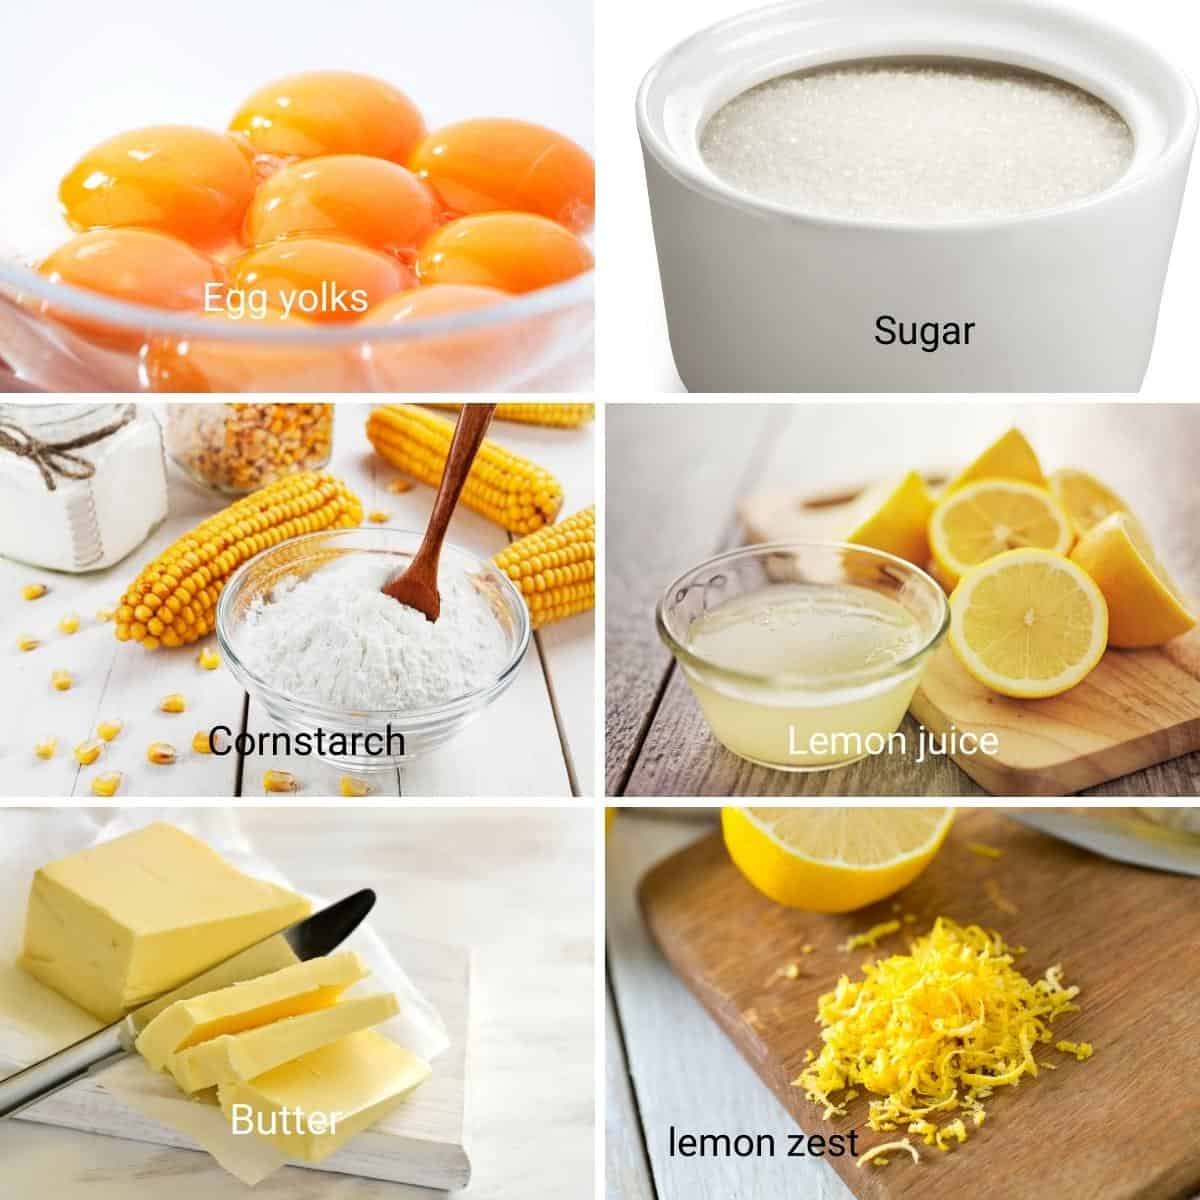 Ingredients for making homemade lemon curd.